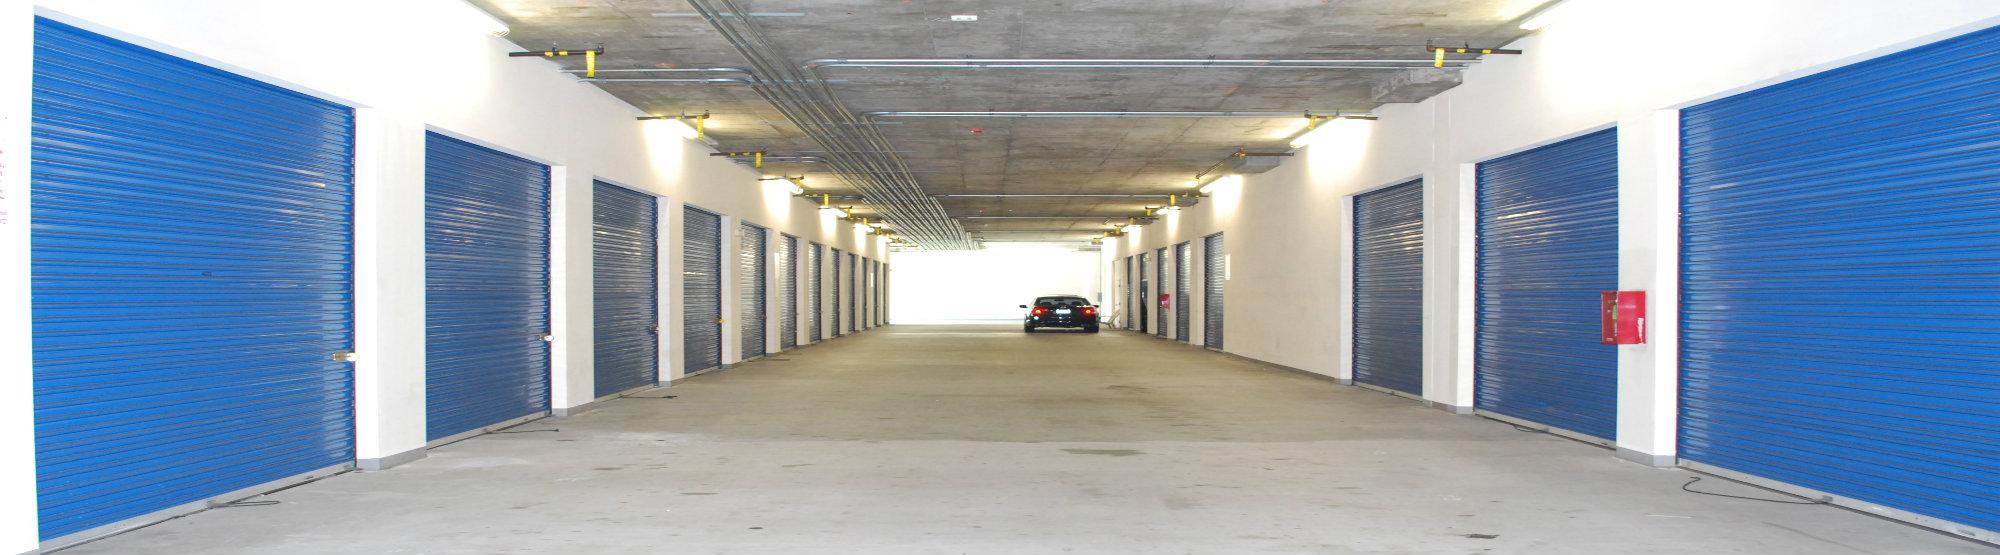 inside storage units California